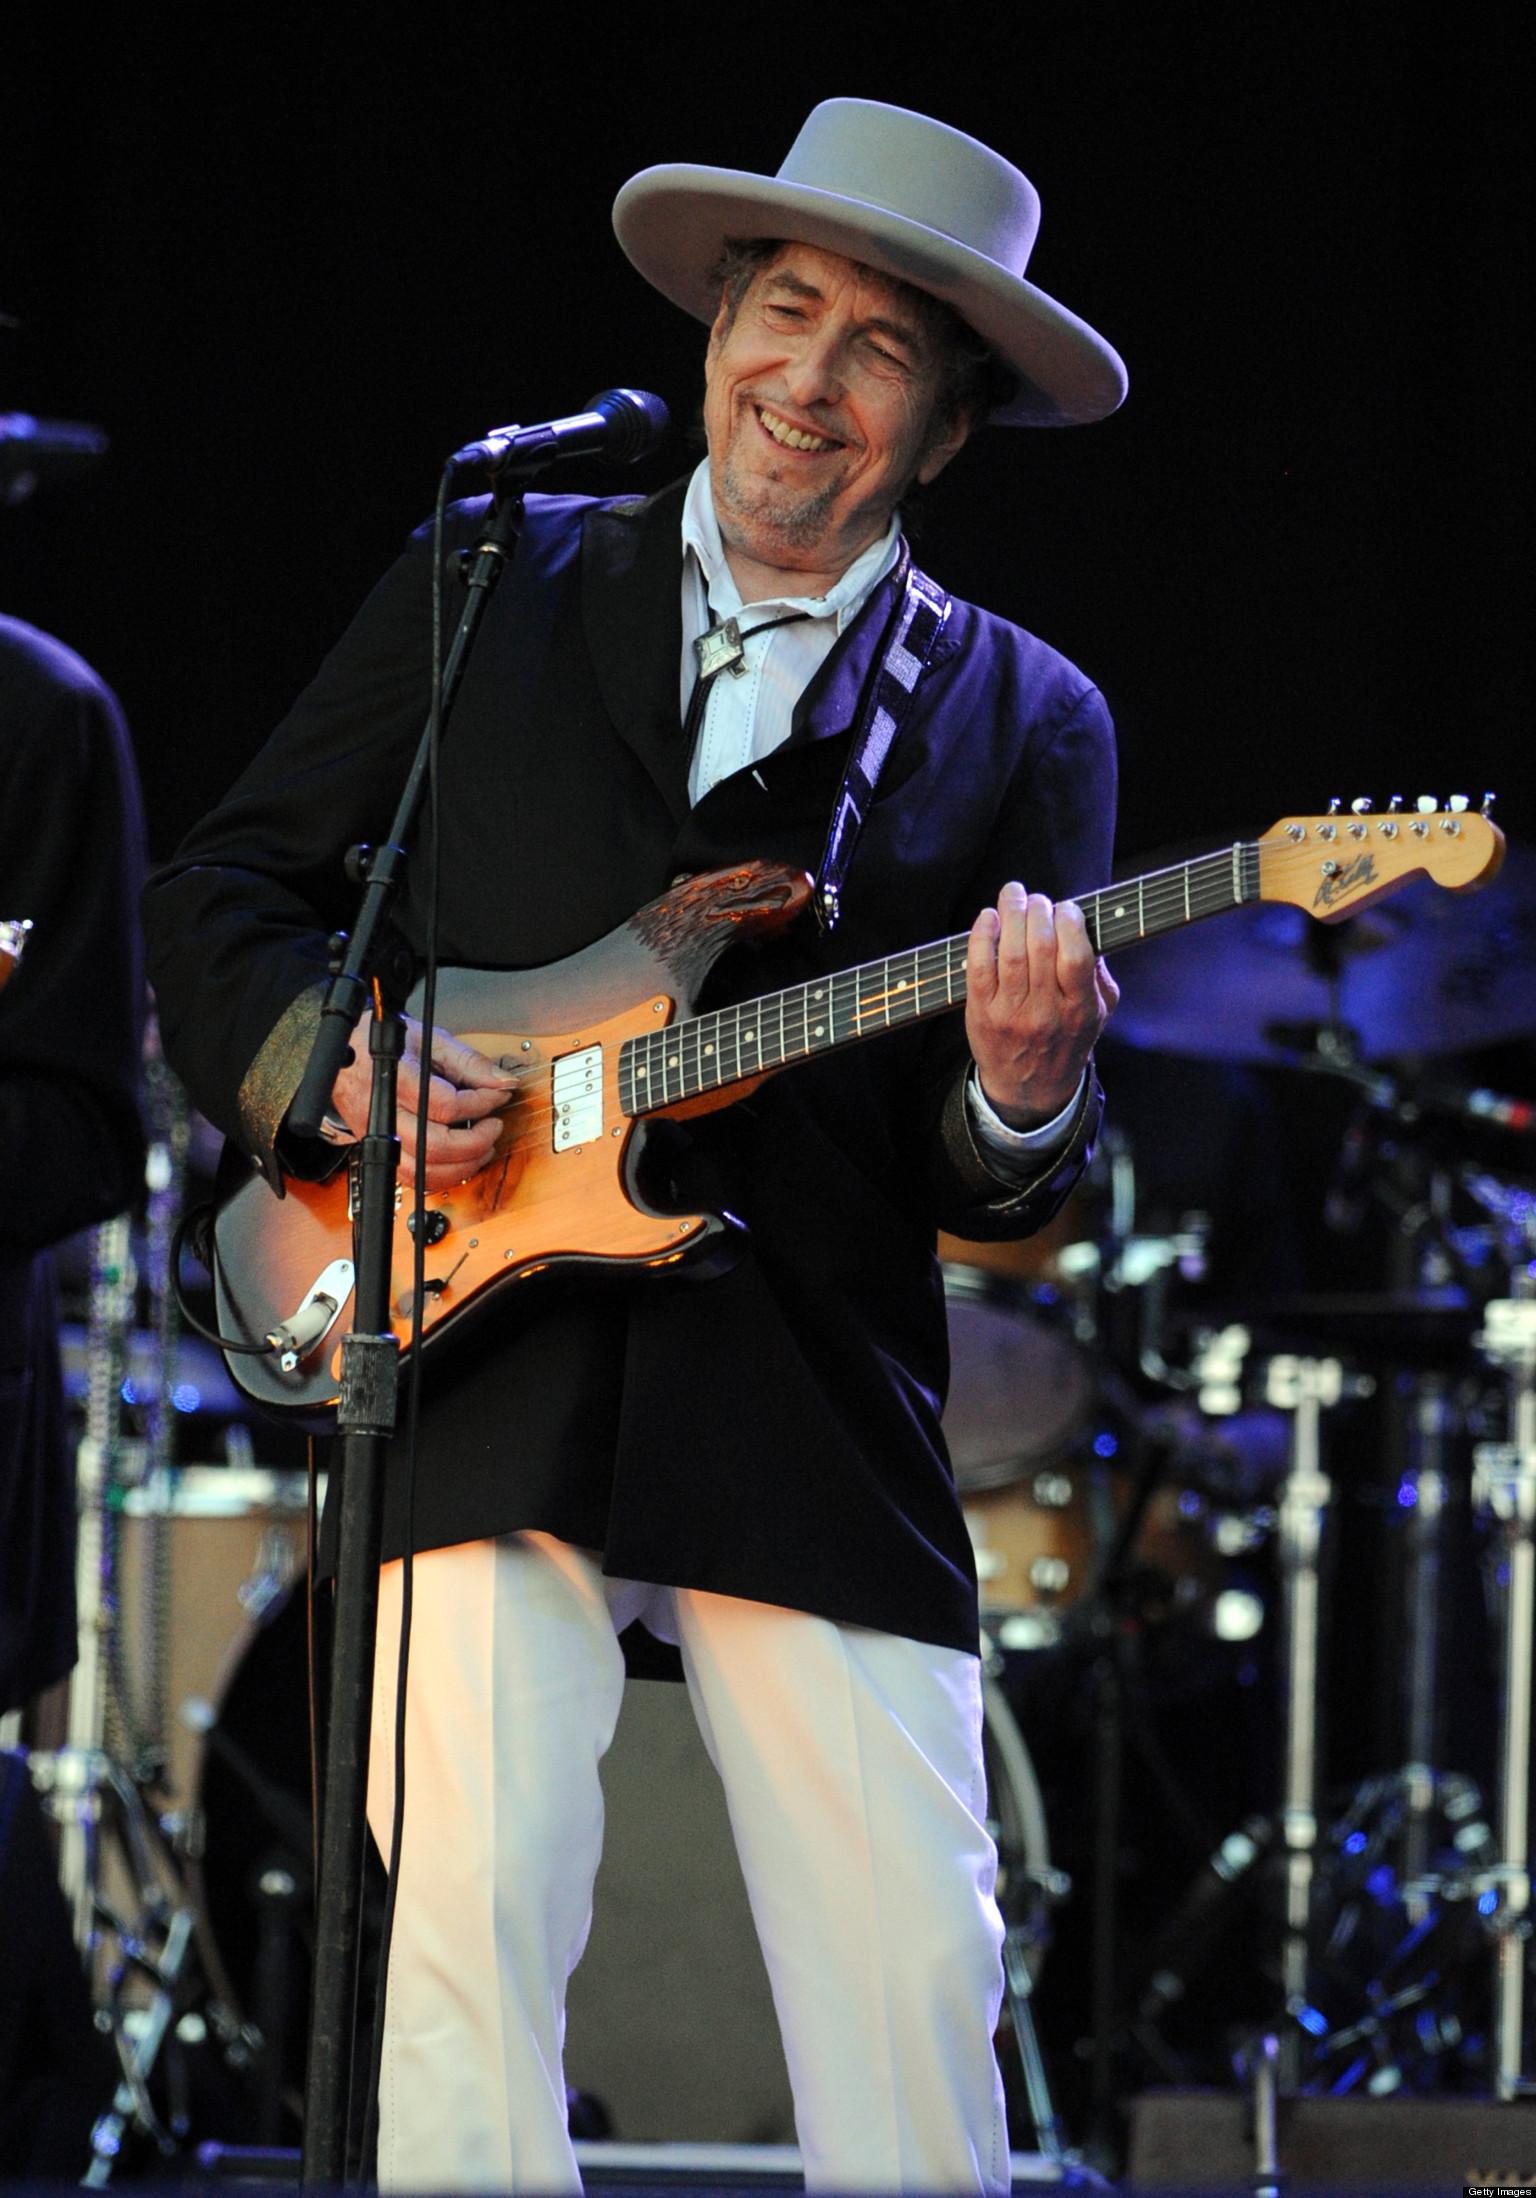 Bob Dylan Tour AmericanaramA Festival Of Music To